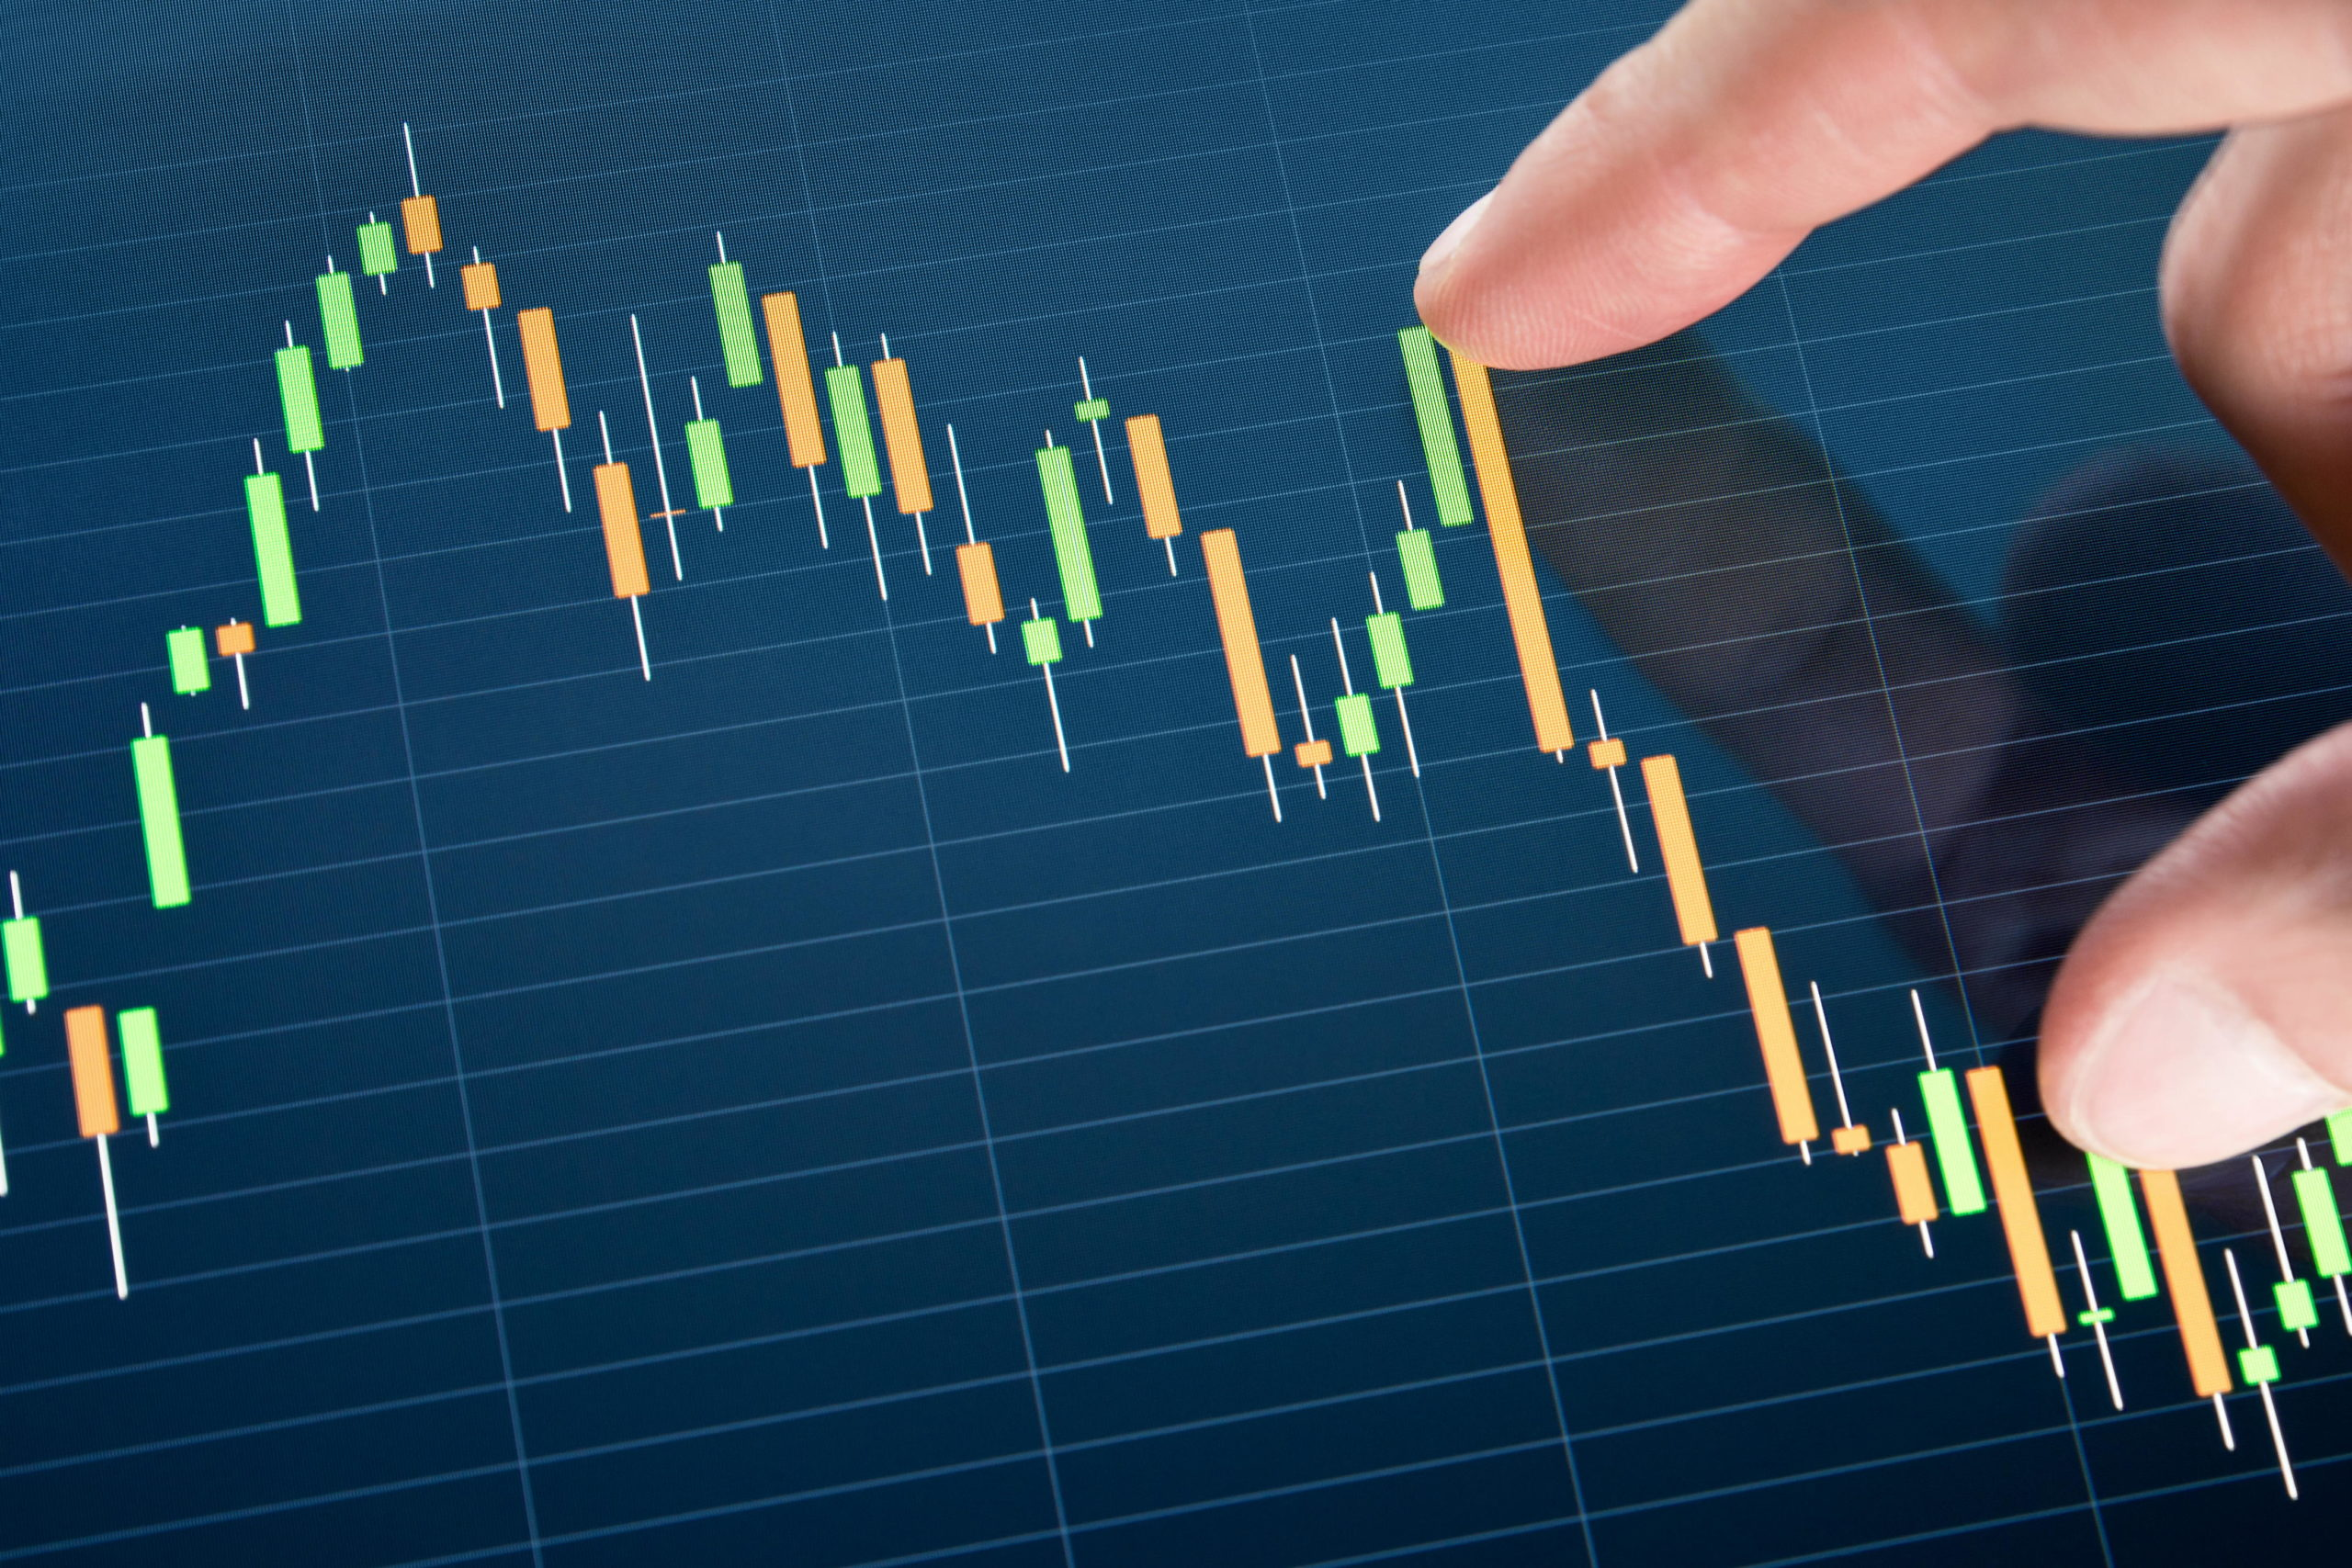 bitcoin btc fiyat analizi sert dusus yasadi kritik seviyeler neler